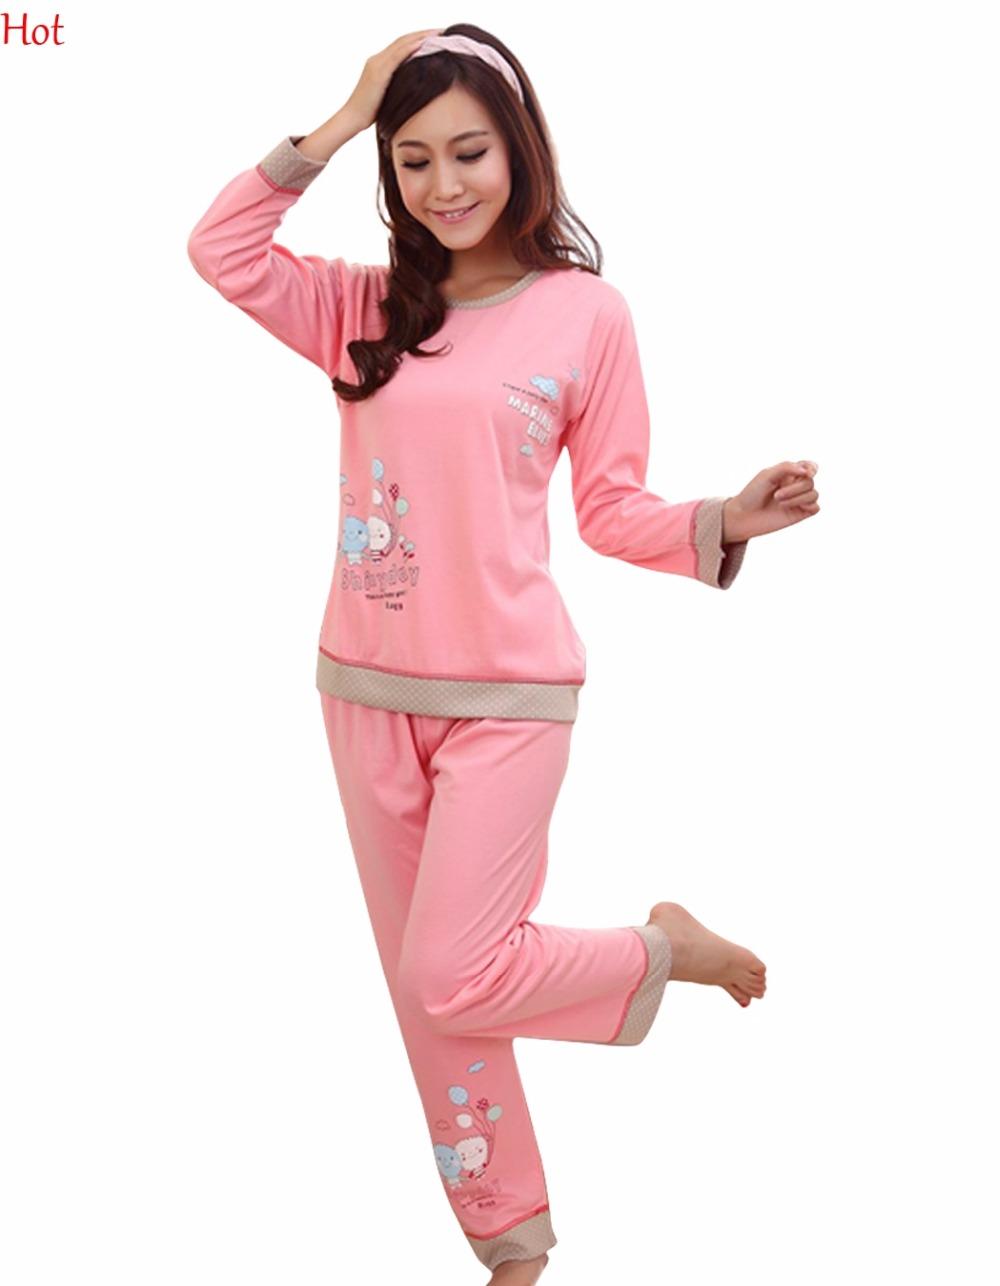 2016 New Women's Long Sleeve Cartoon Pattern Cotton Pajamas Sleepwear Sleep Clothes Pink M/L/XL(China (Mainland))